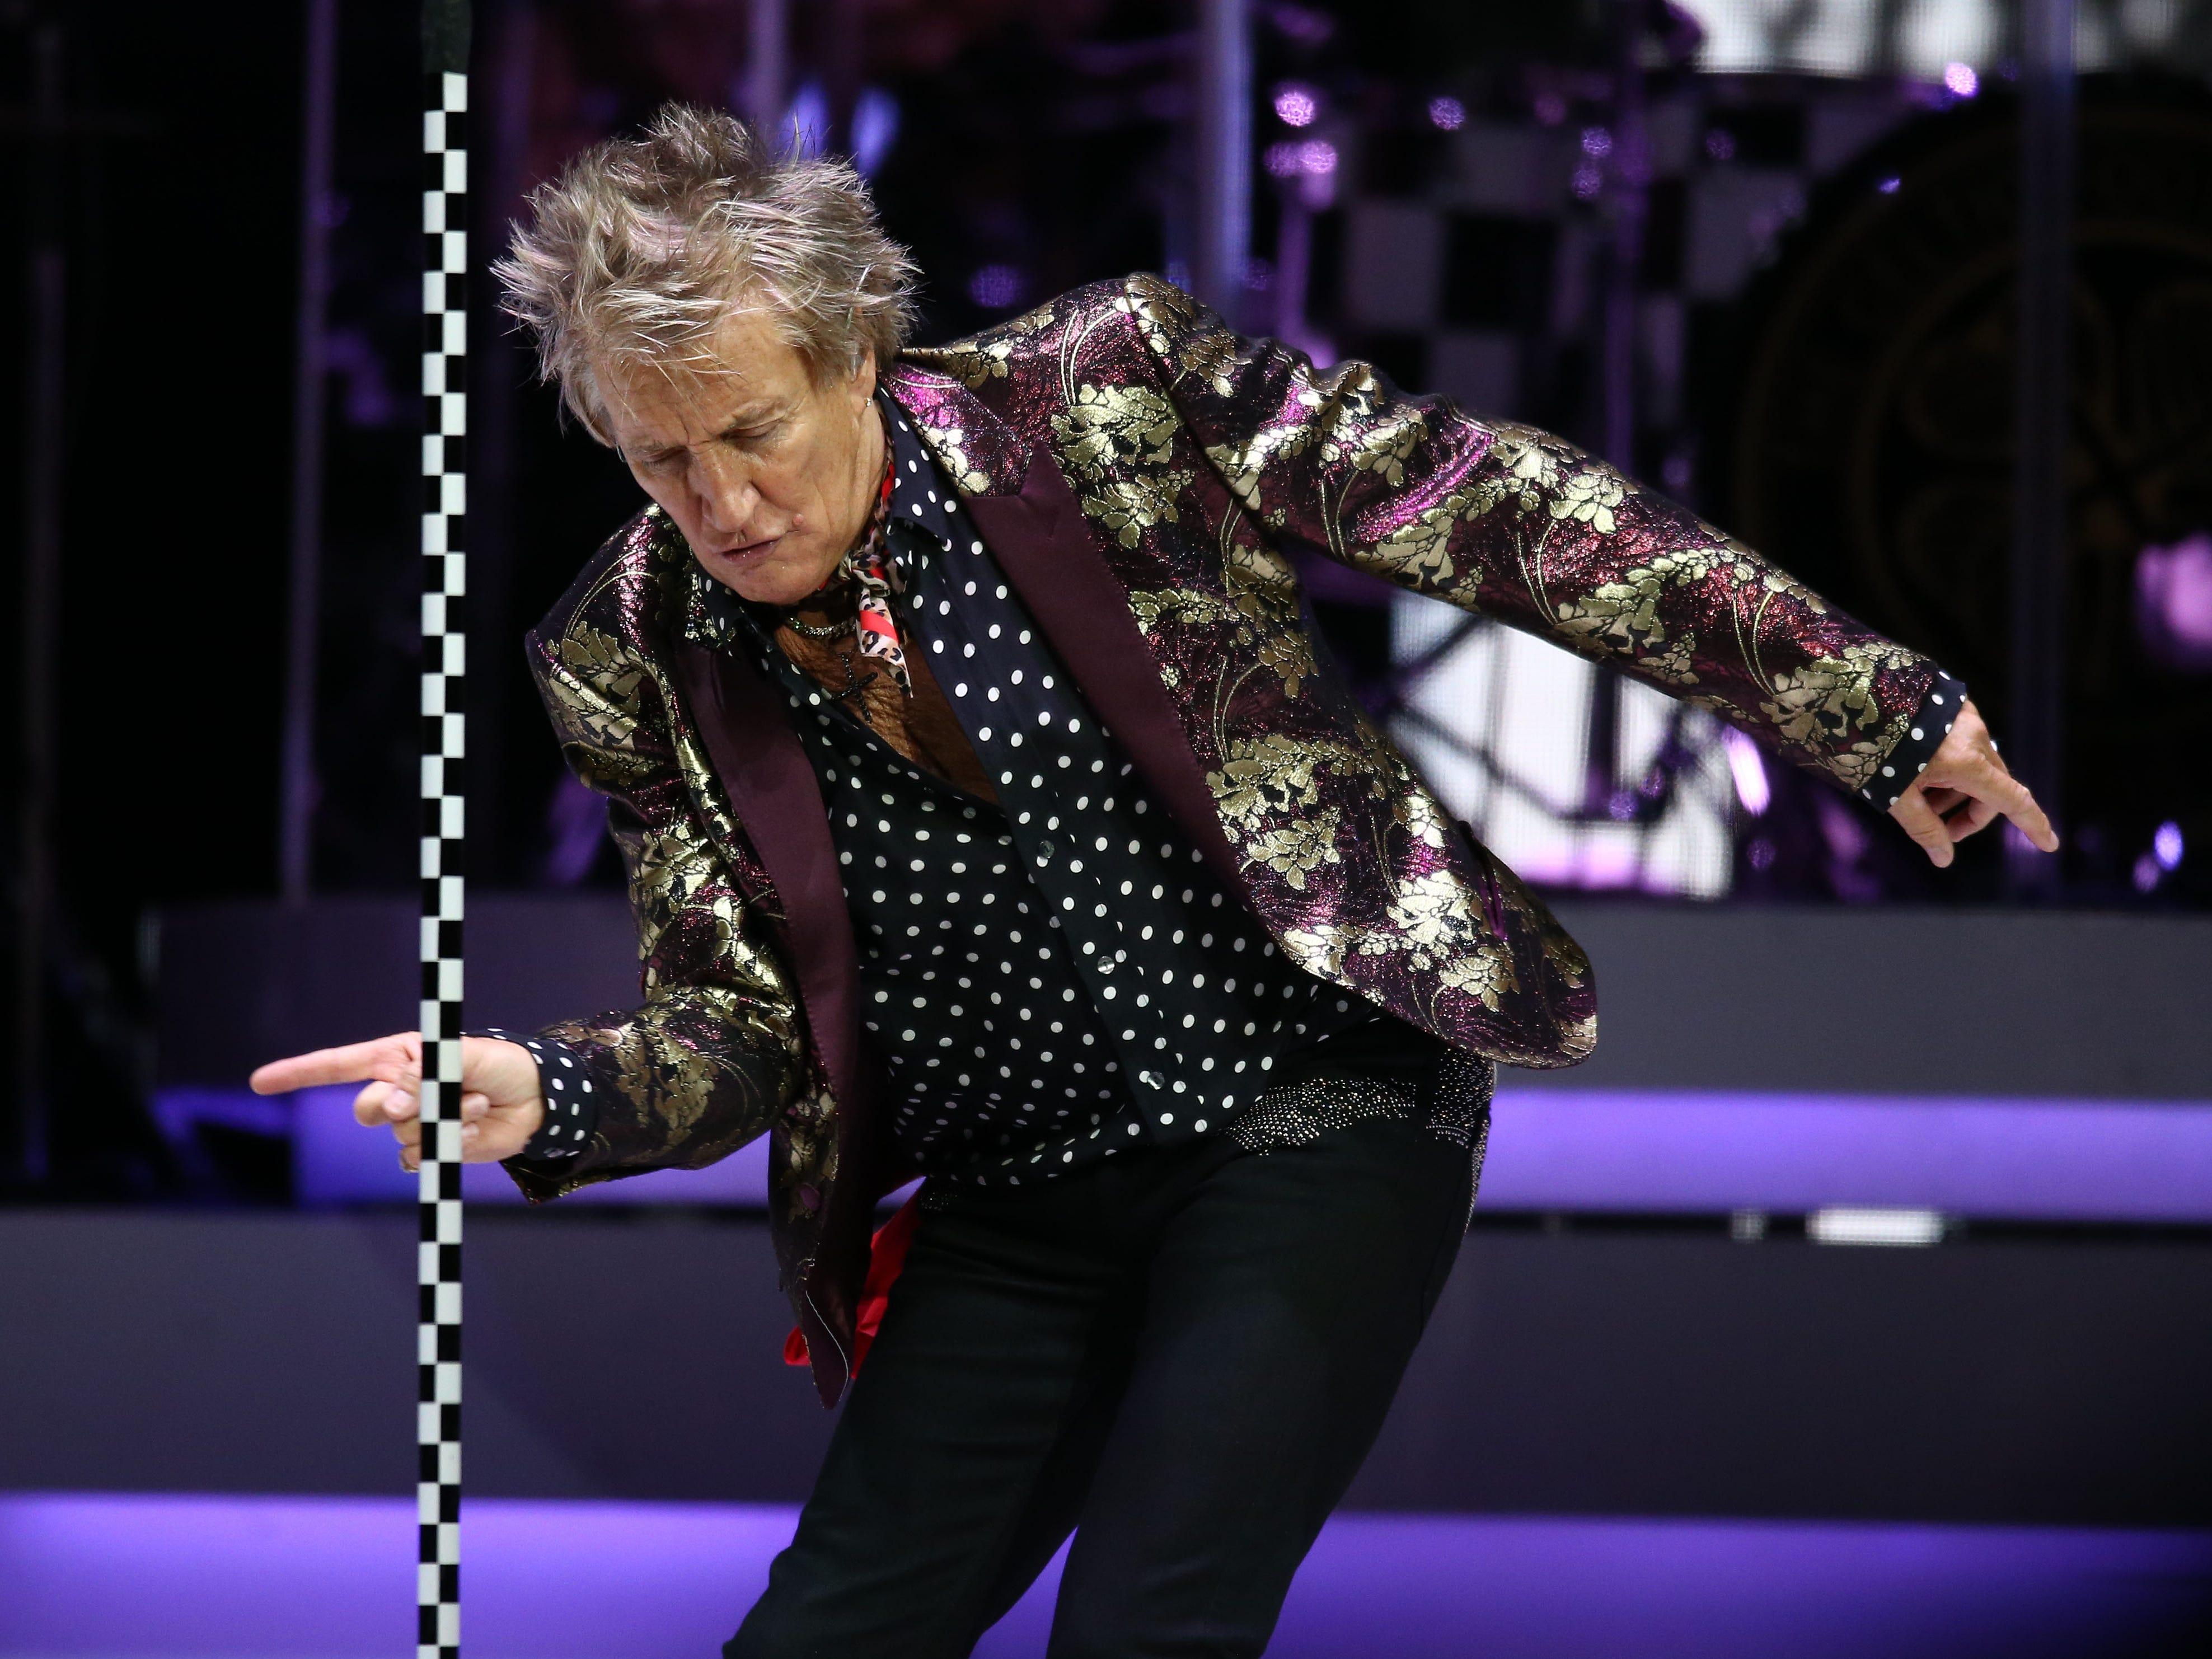 Rod Stewart performs on Aug. 24, 2018, at Talking Stick Resort Arena in Phoenix, Ariz.